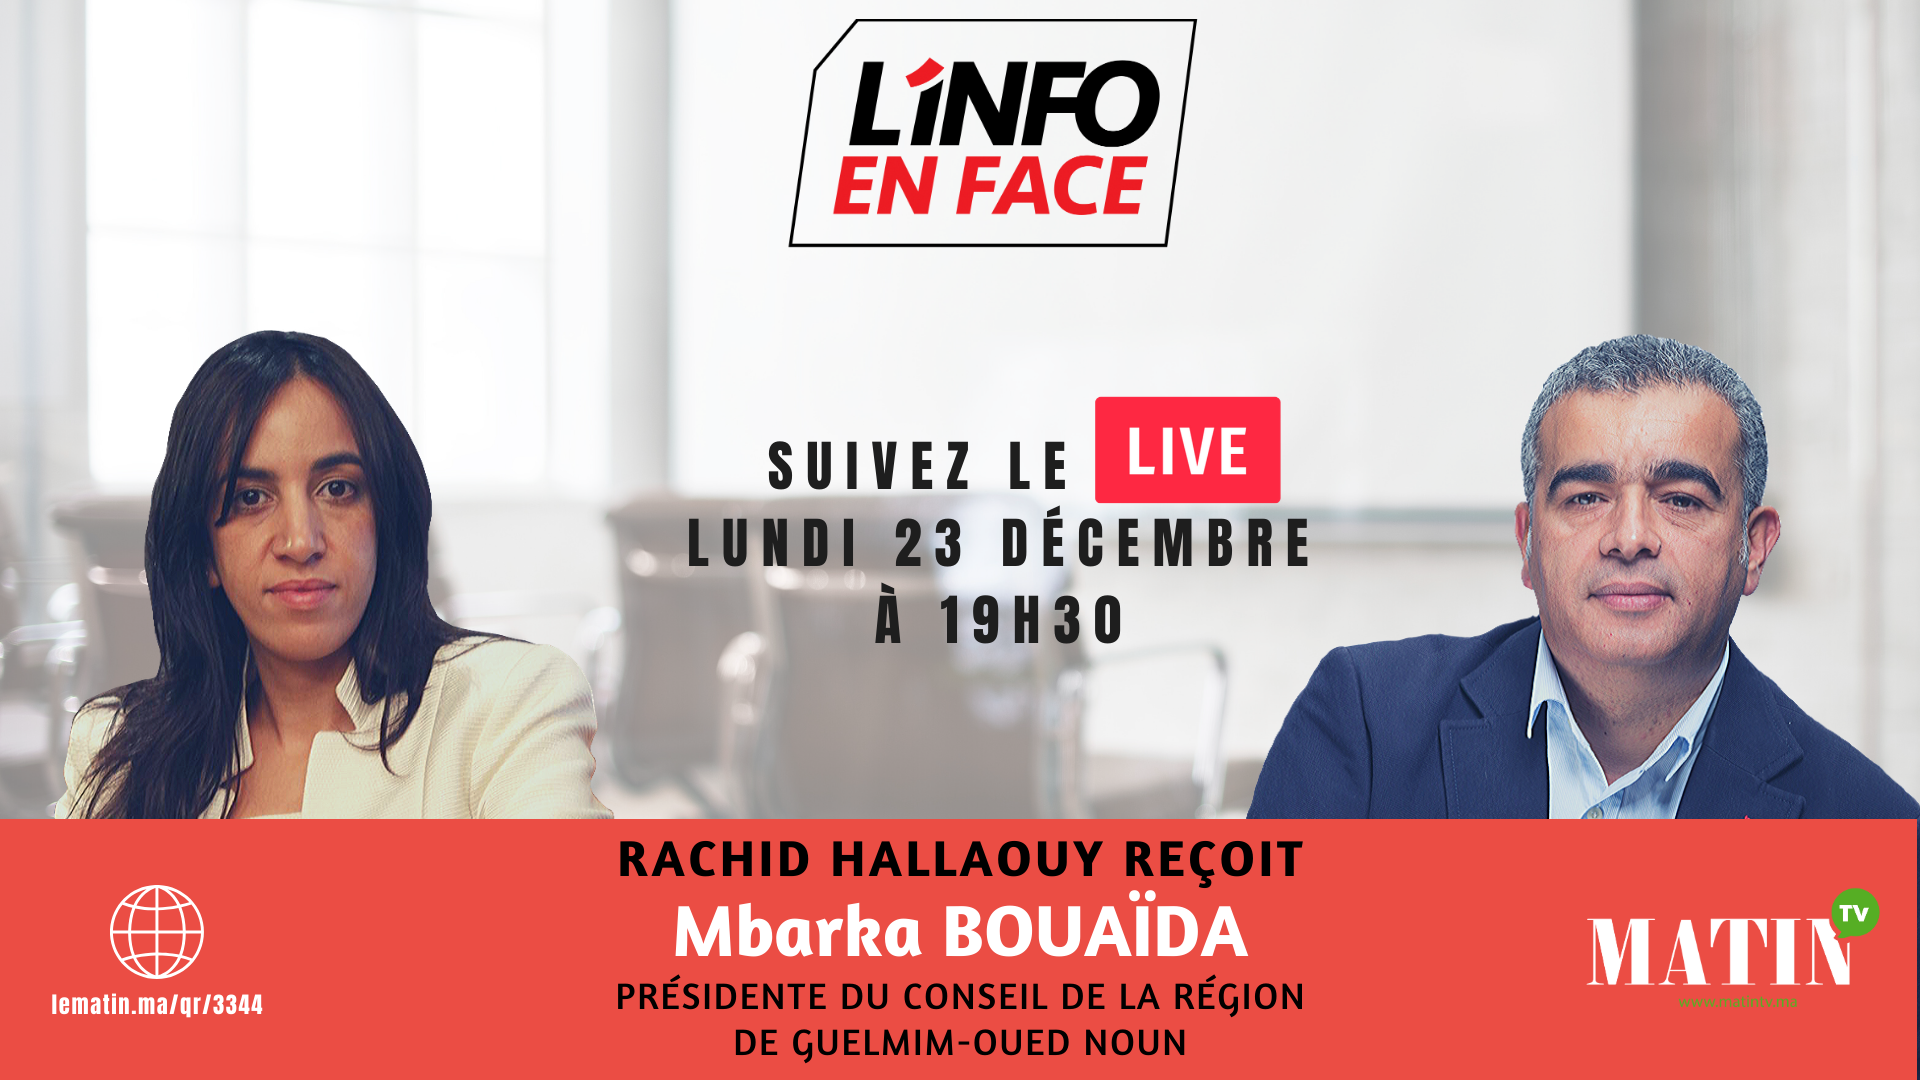 Live : L'Info en Face spécial CNRA avec Mbarka Bouaïda